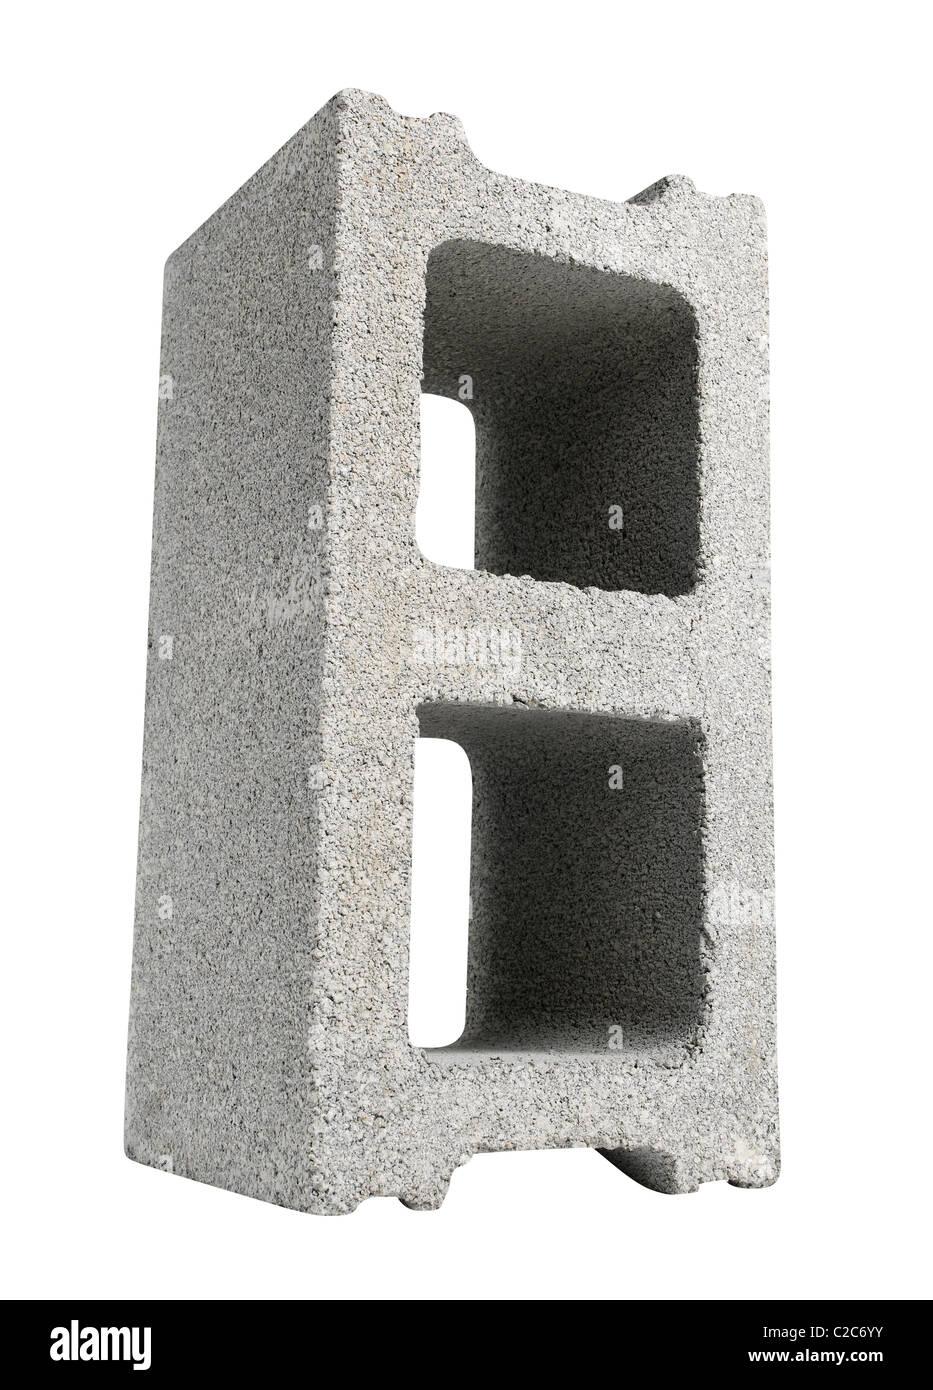 cinder blocks - Stock Image